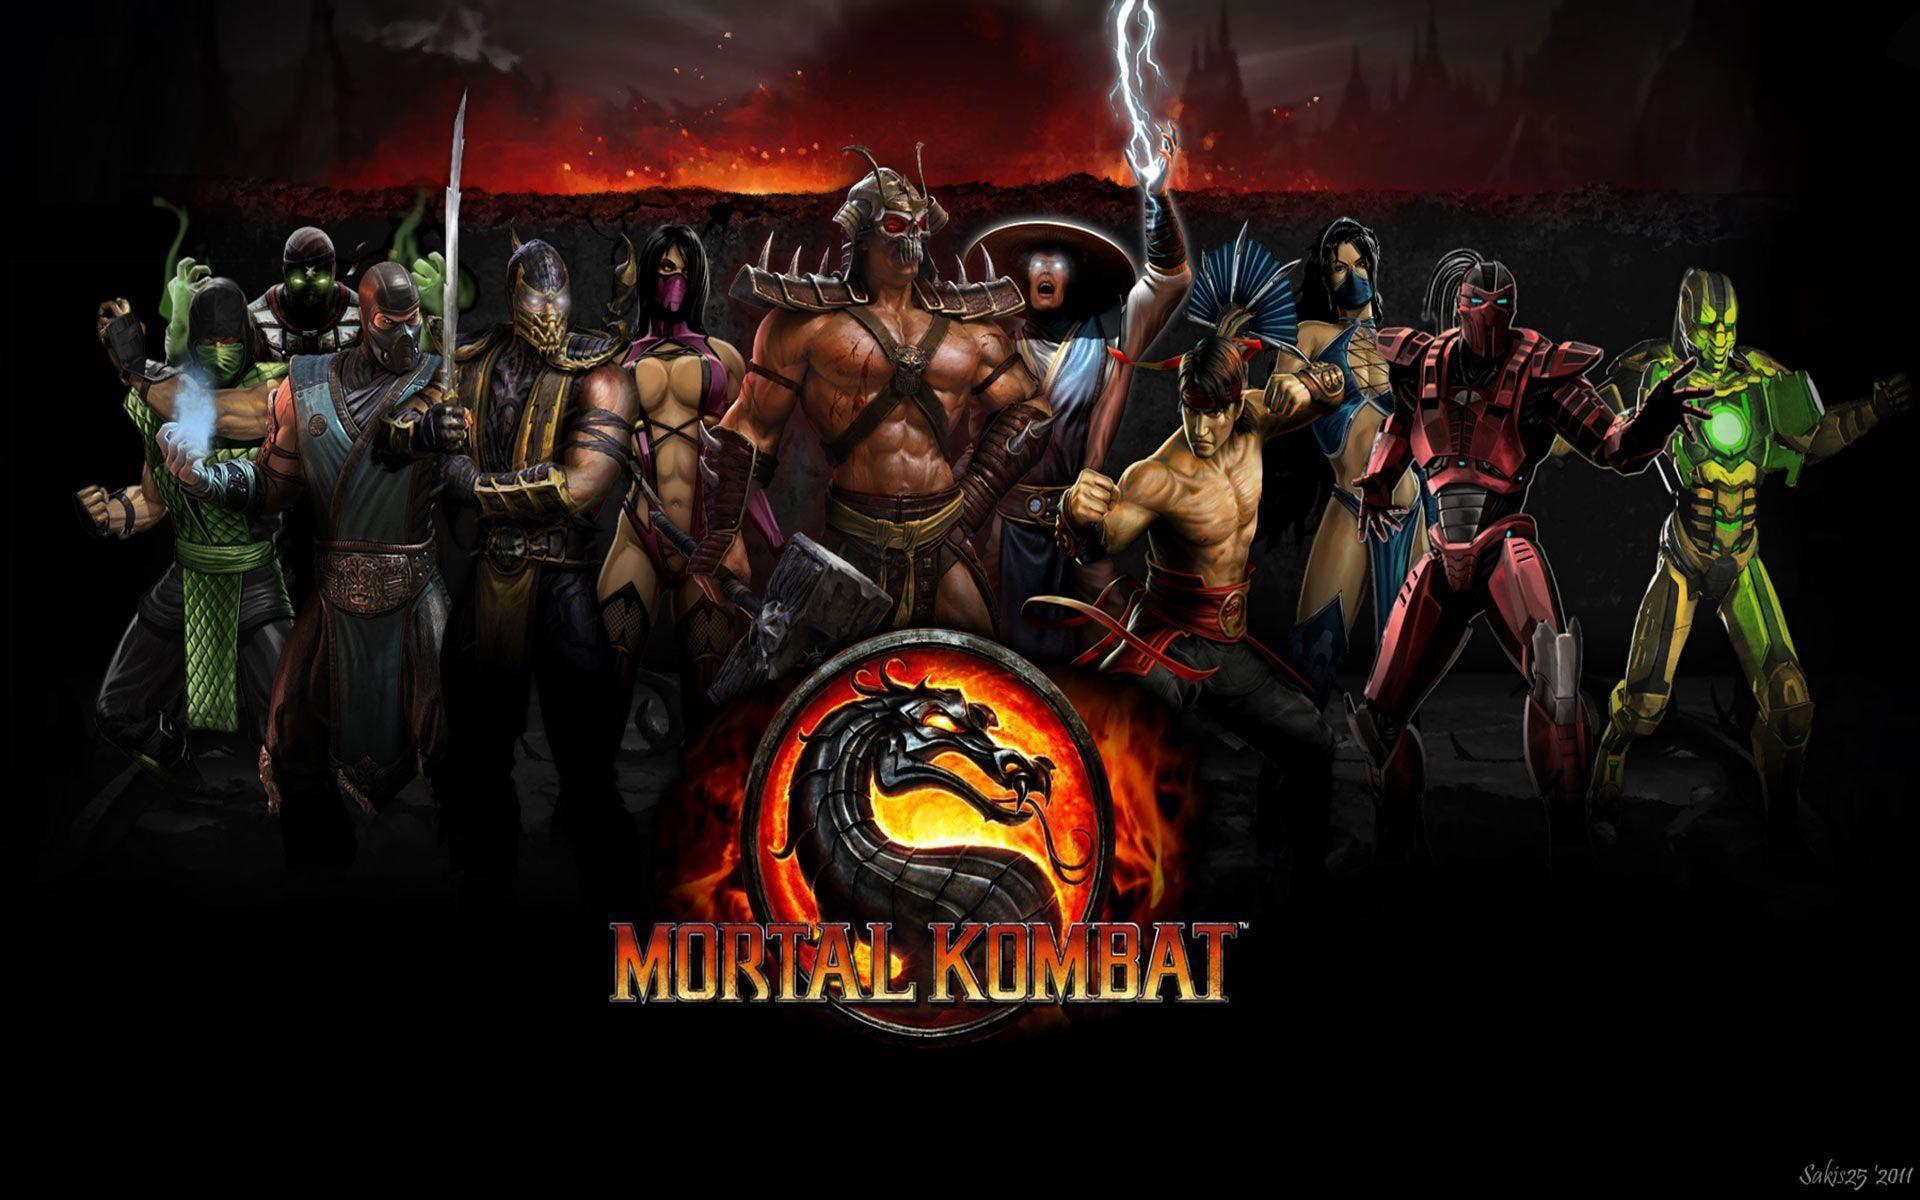 Mortal Kombat Characters Wallpapers - Wallpaper Cave